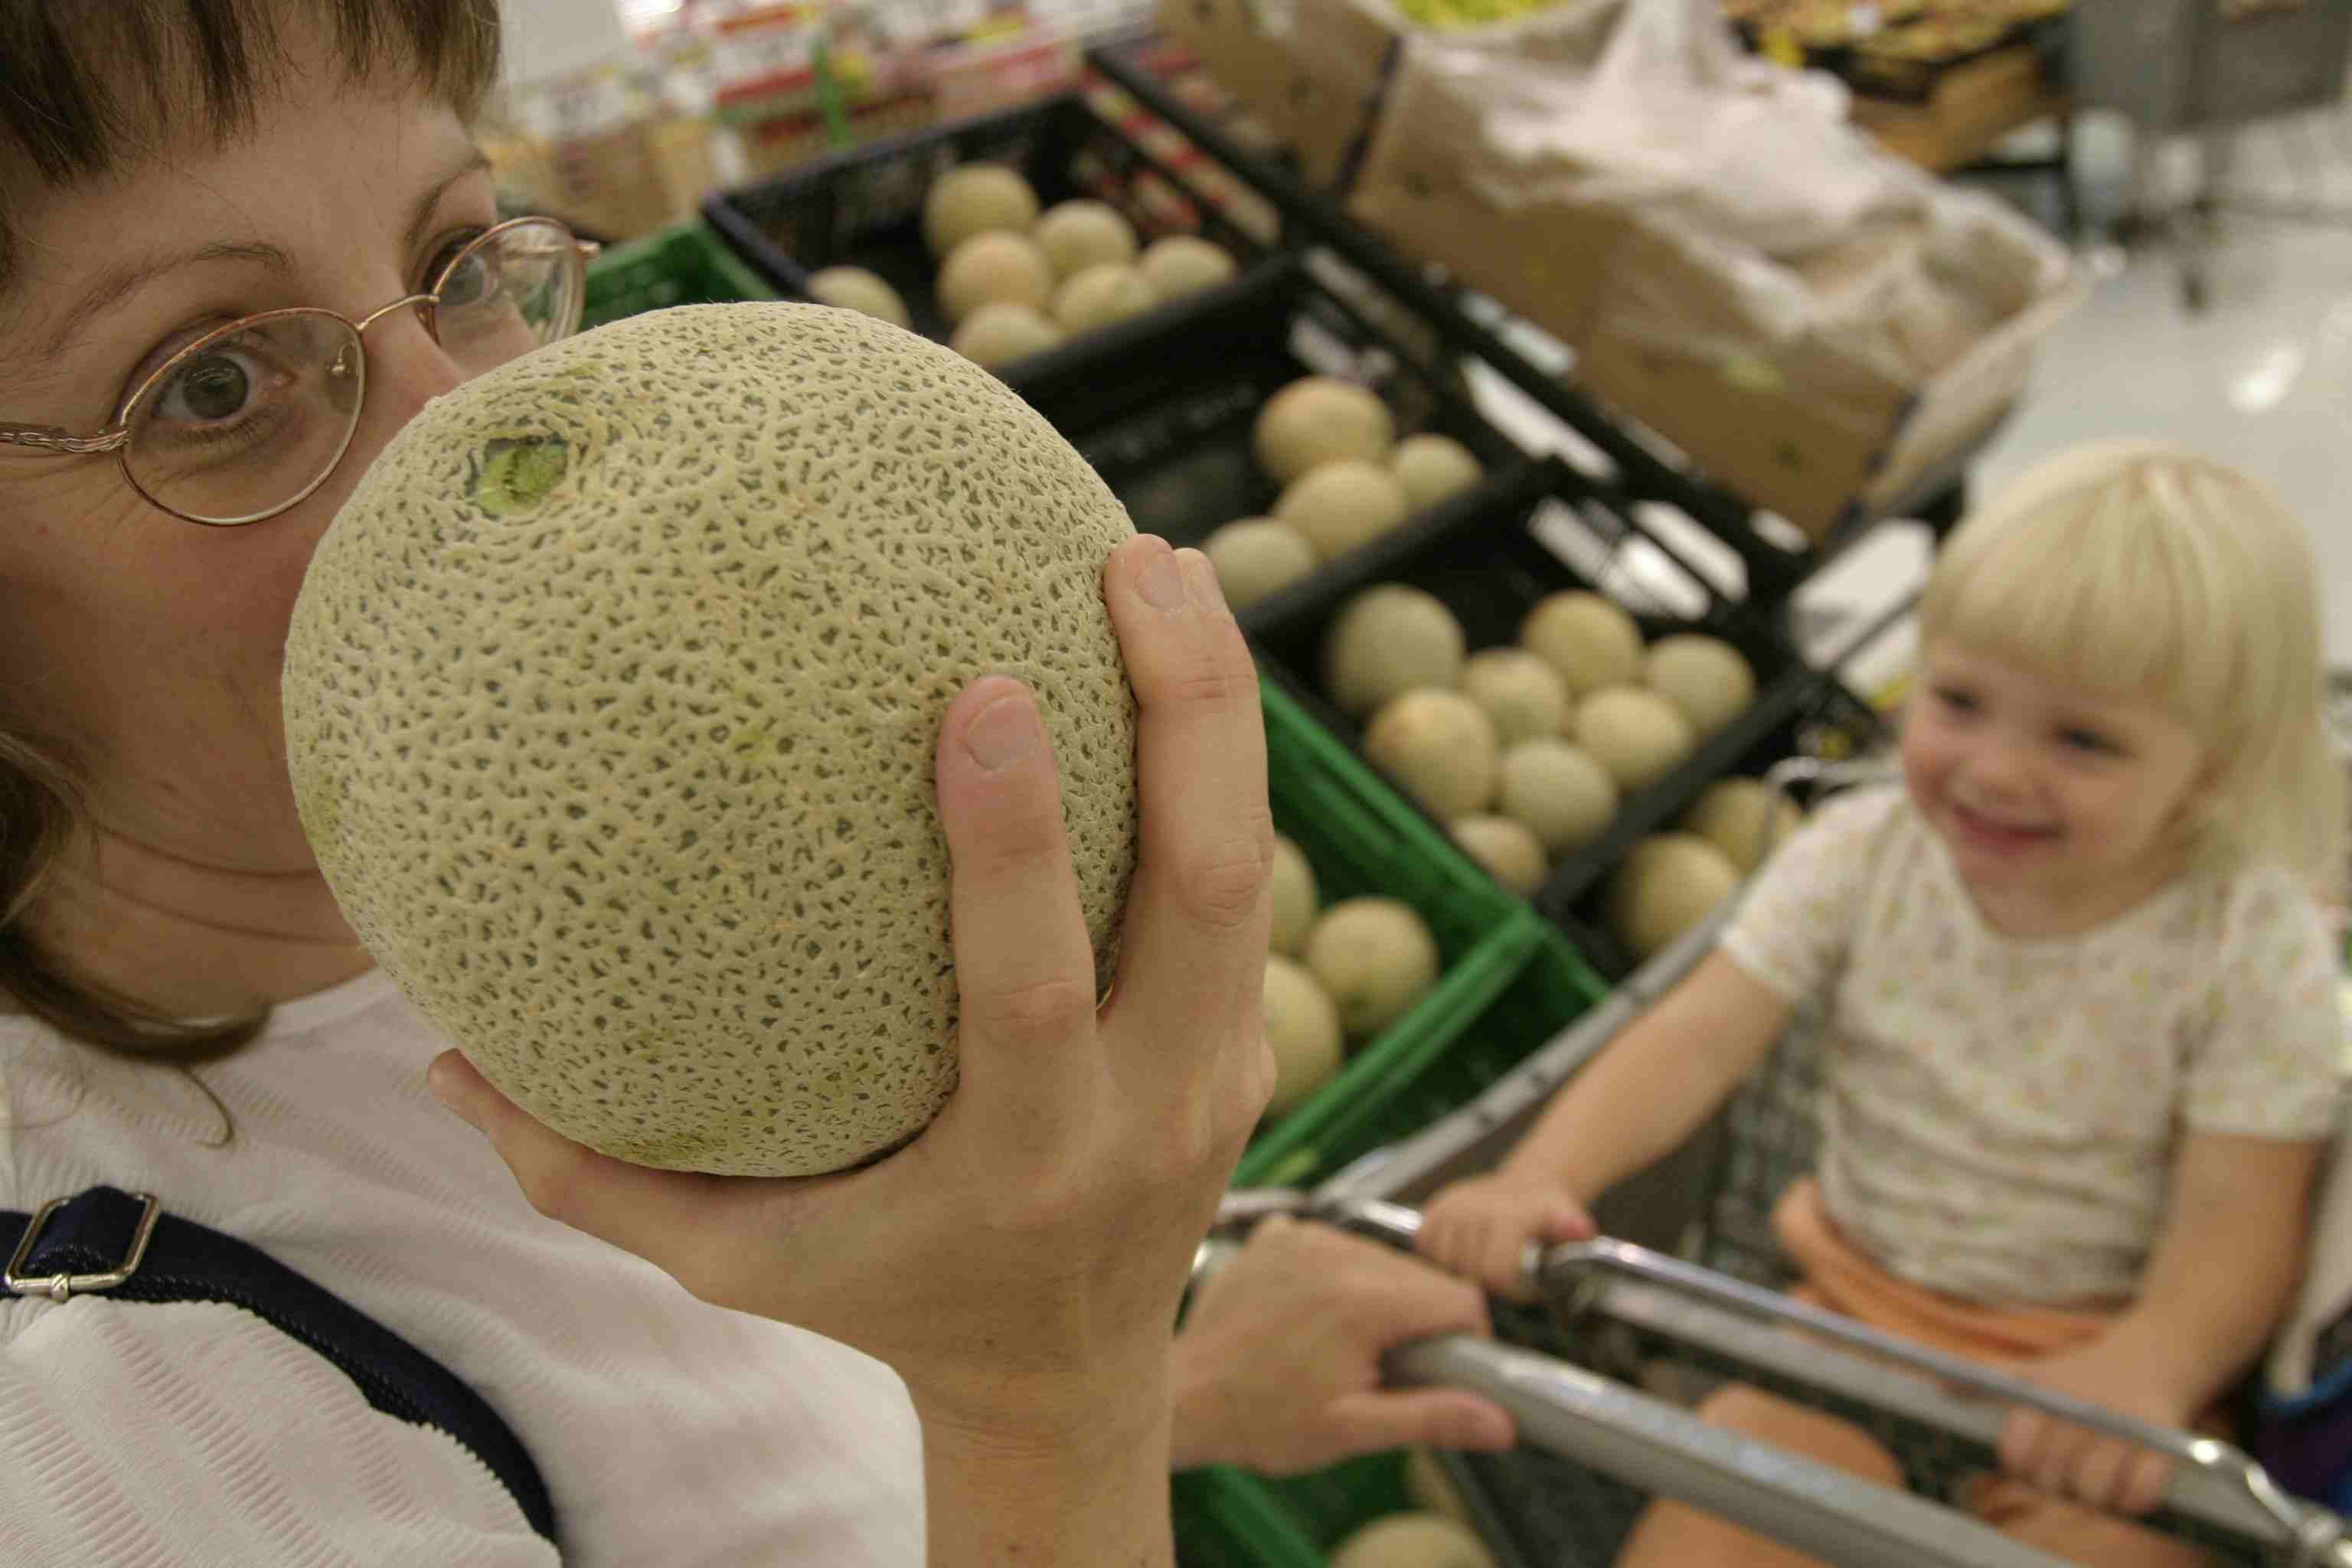 Walmart Shopper Buying Produce